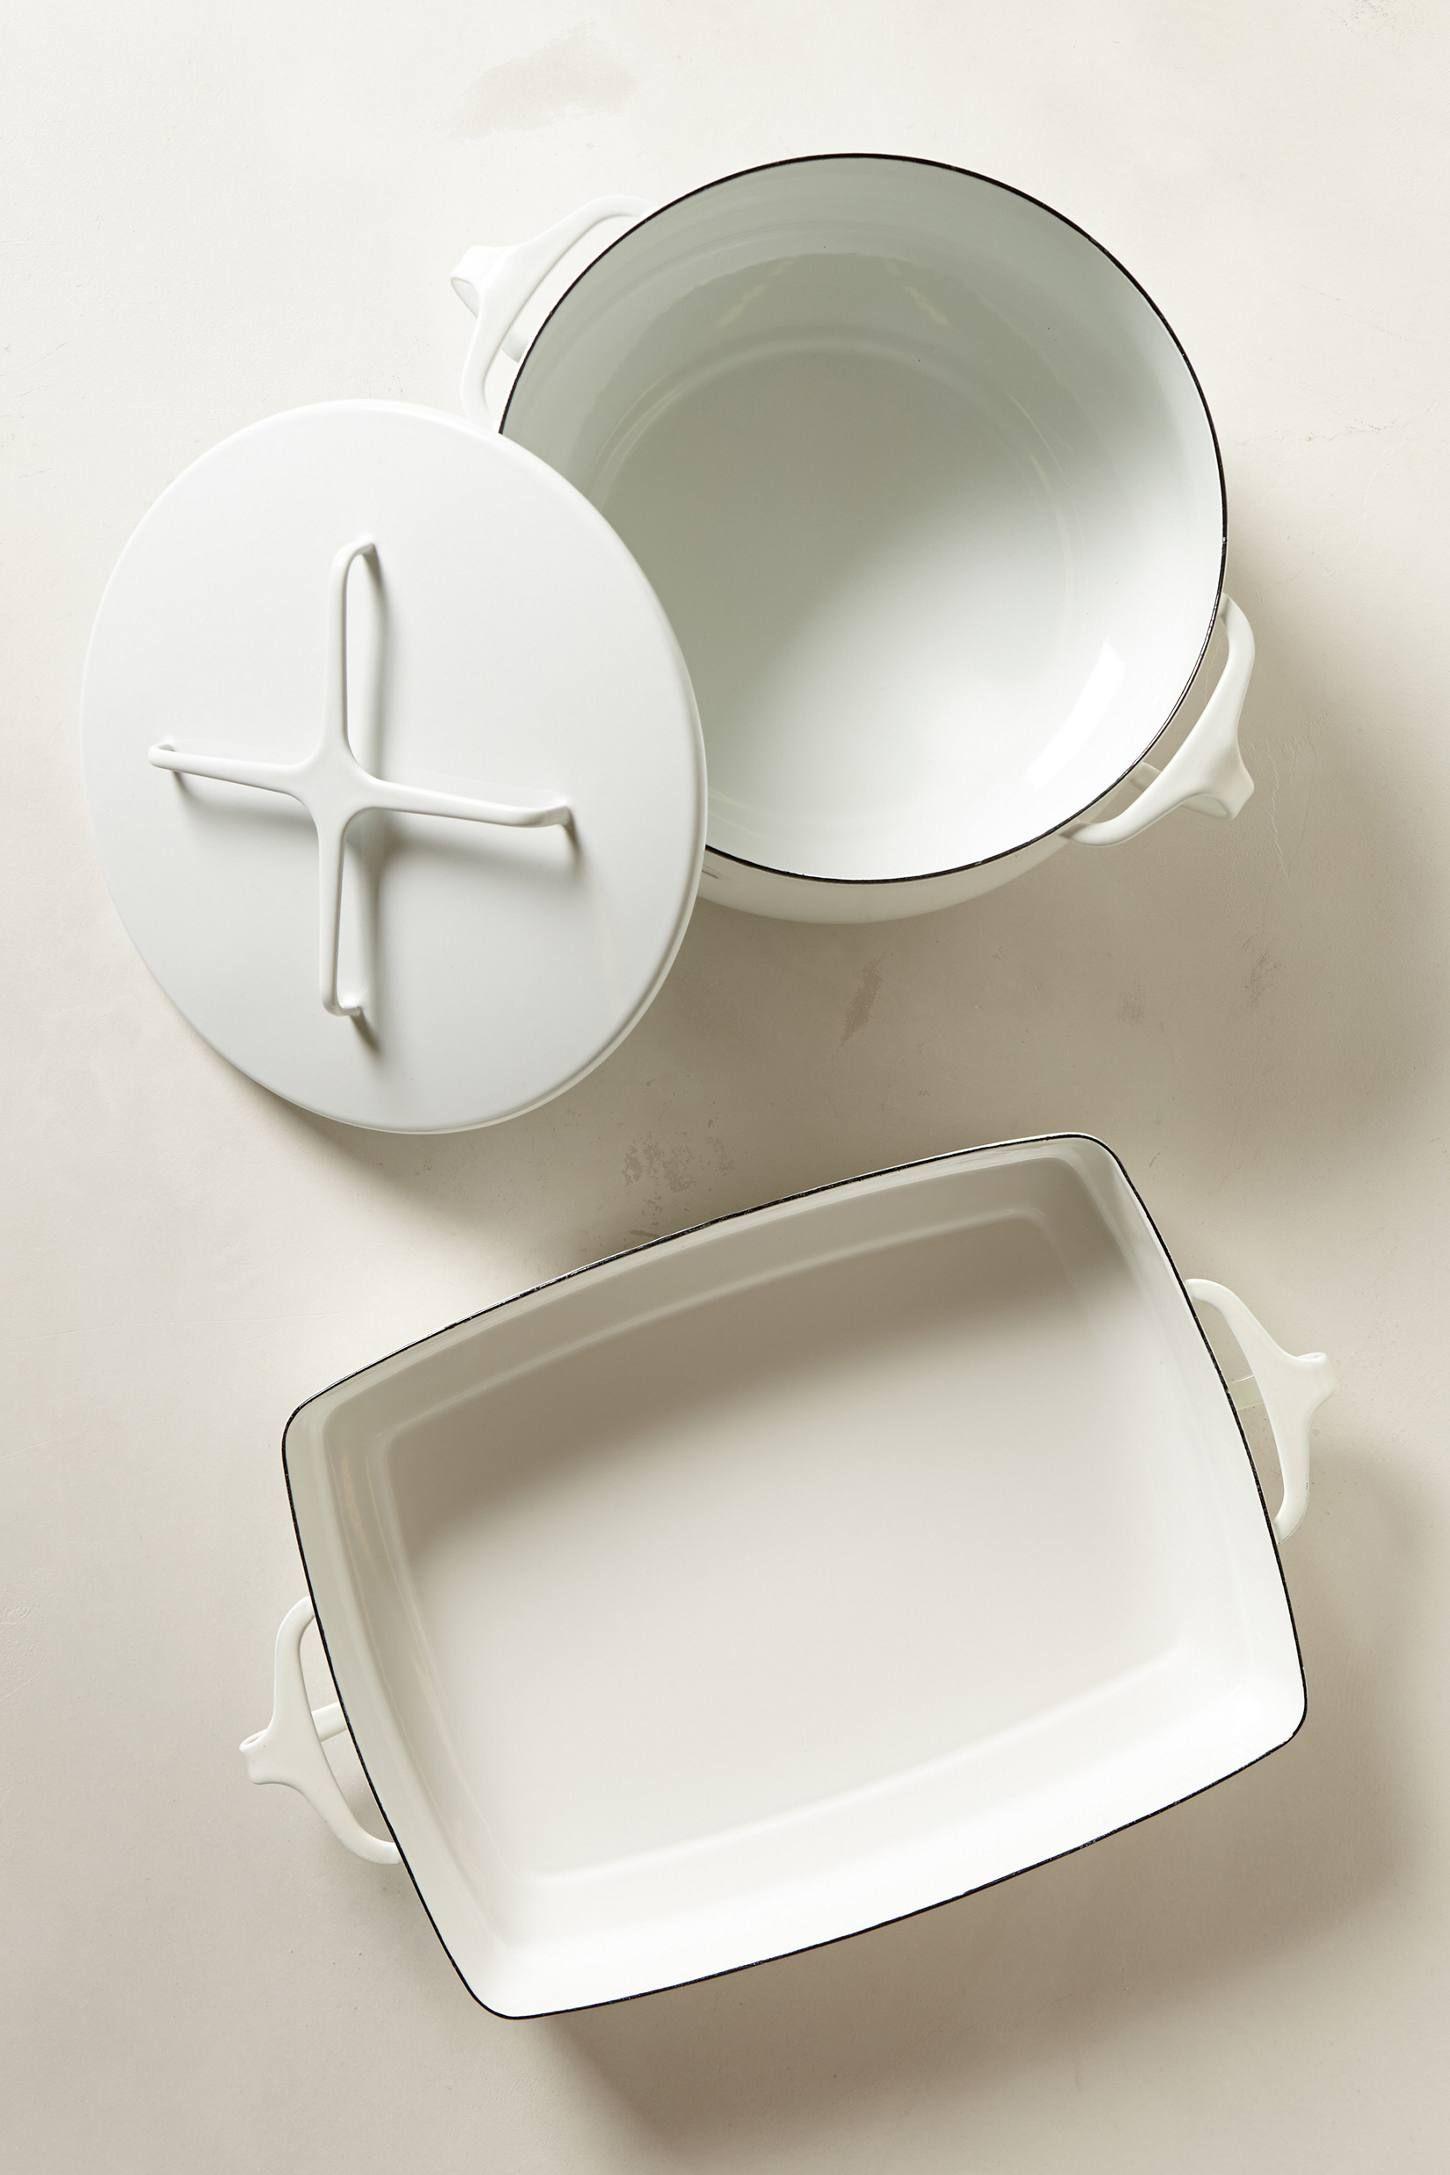 dansk - kobenstyle cookware  s l saucepan . butter warmer . l baker & dansk - kobenstyle cookware : s l saucepan . butter warmer . l baker ...